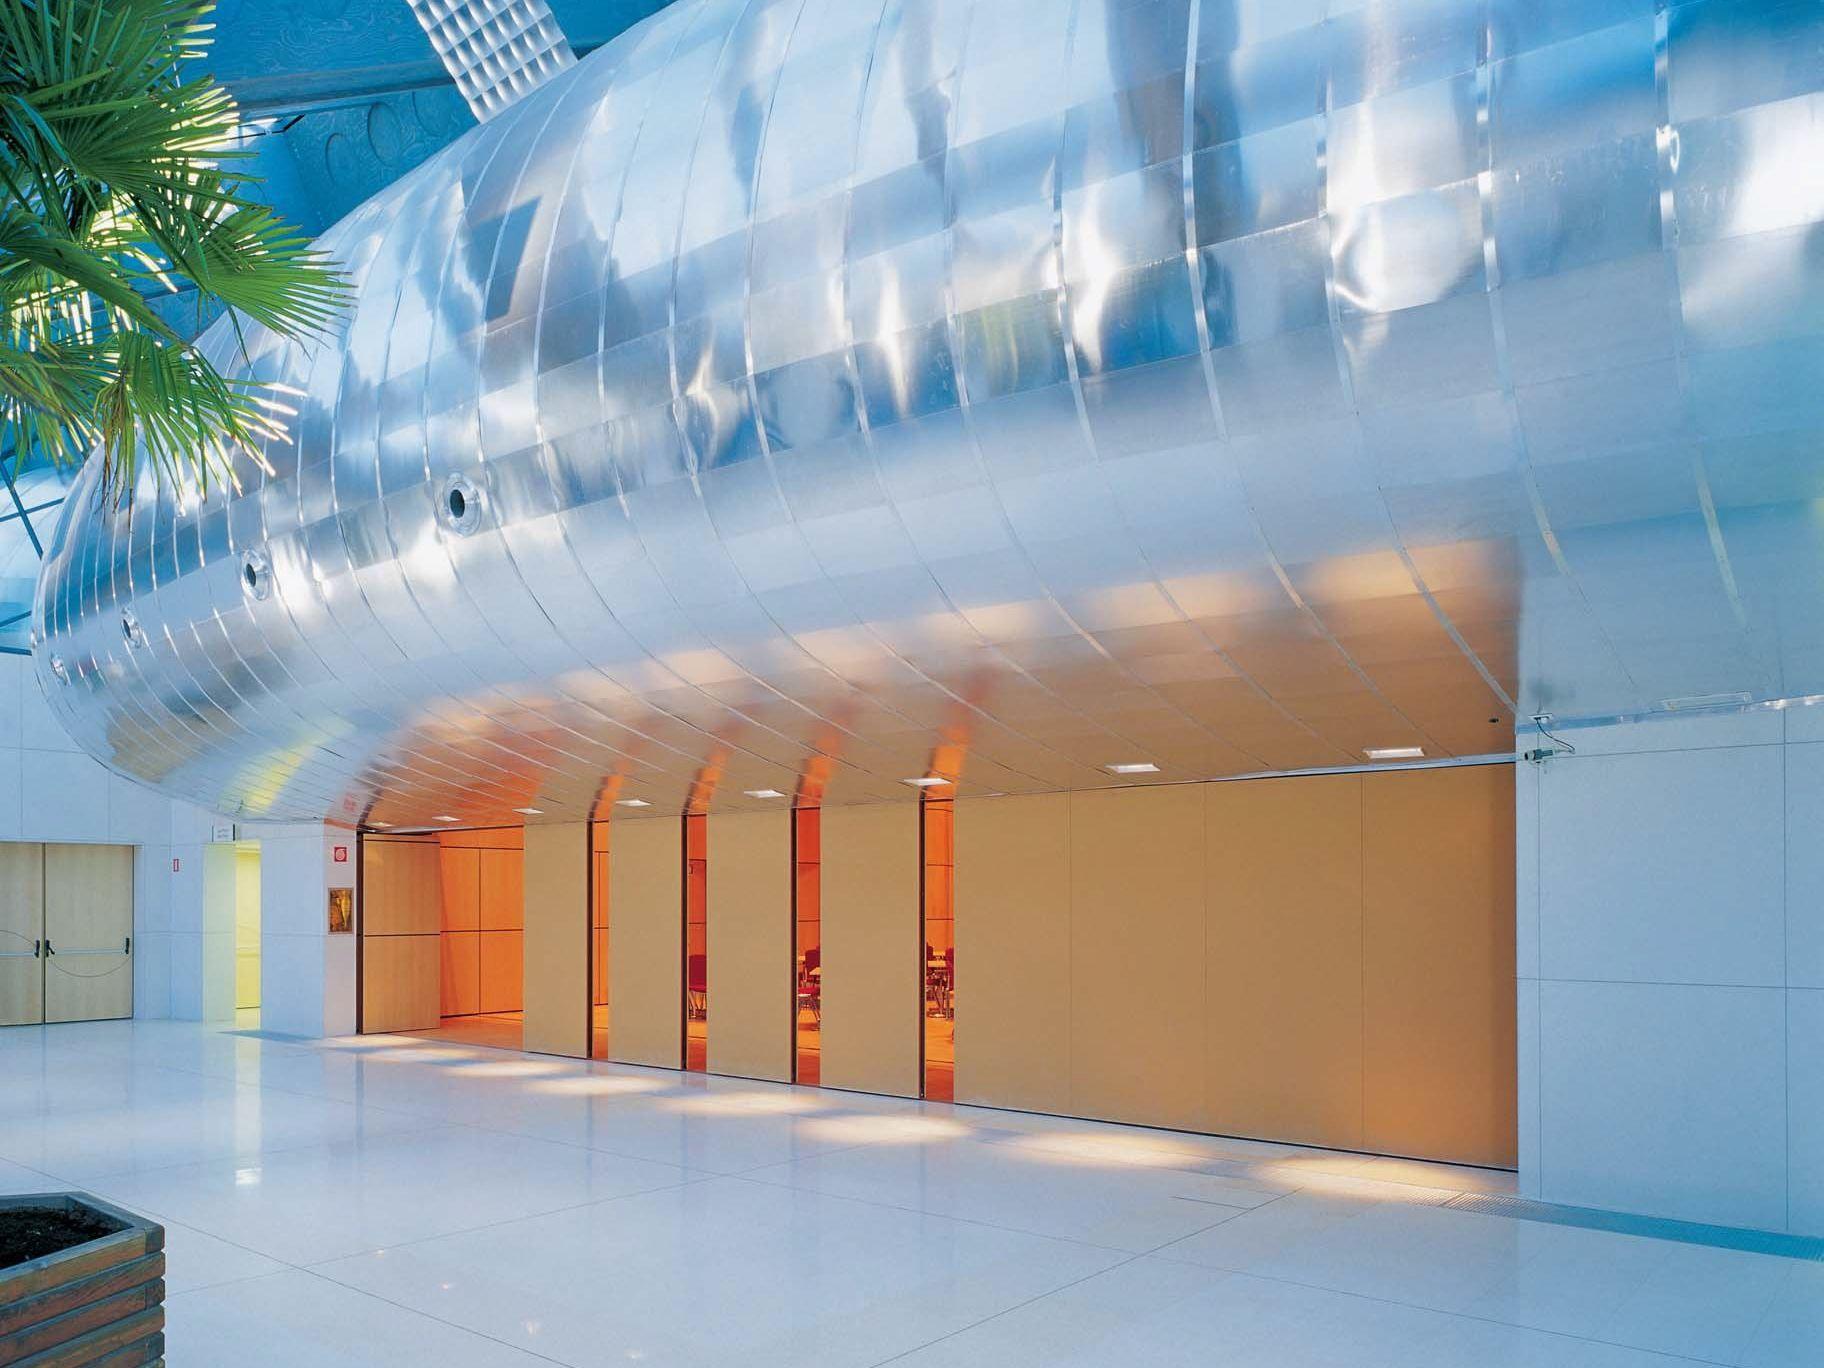 acoustic sliding operable wall rei 60 by estfeller pareti - Pareti Rei